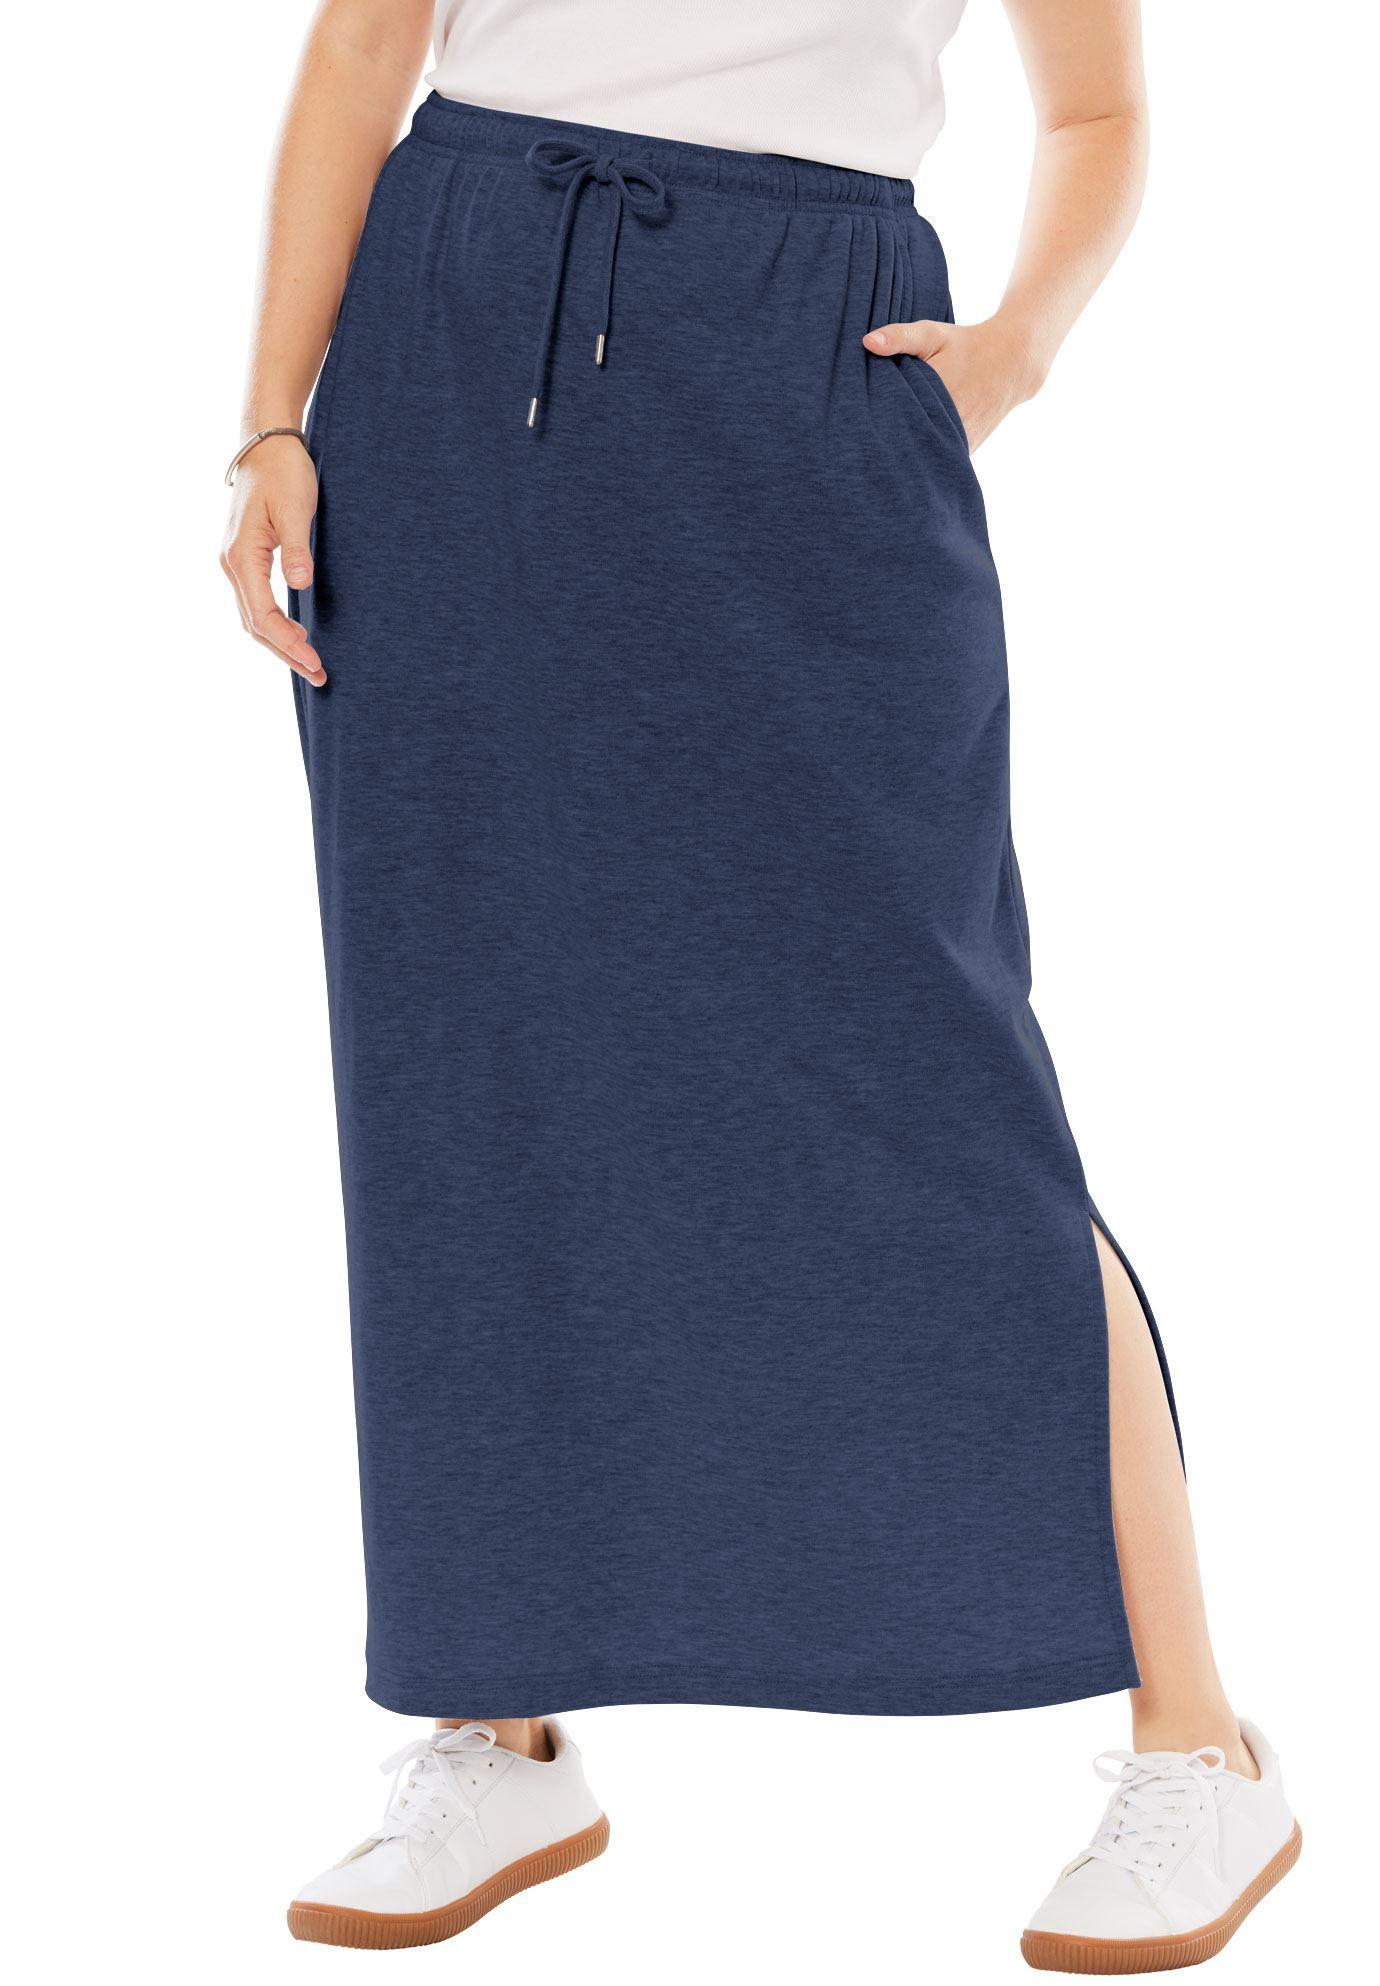 4c0426f99f Petite A-line Sport Knit Skirt - Women's Plus Size Clothing ...